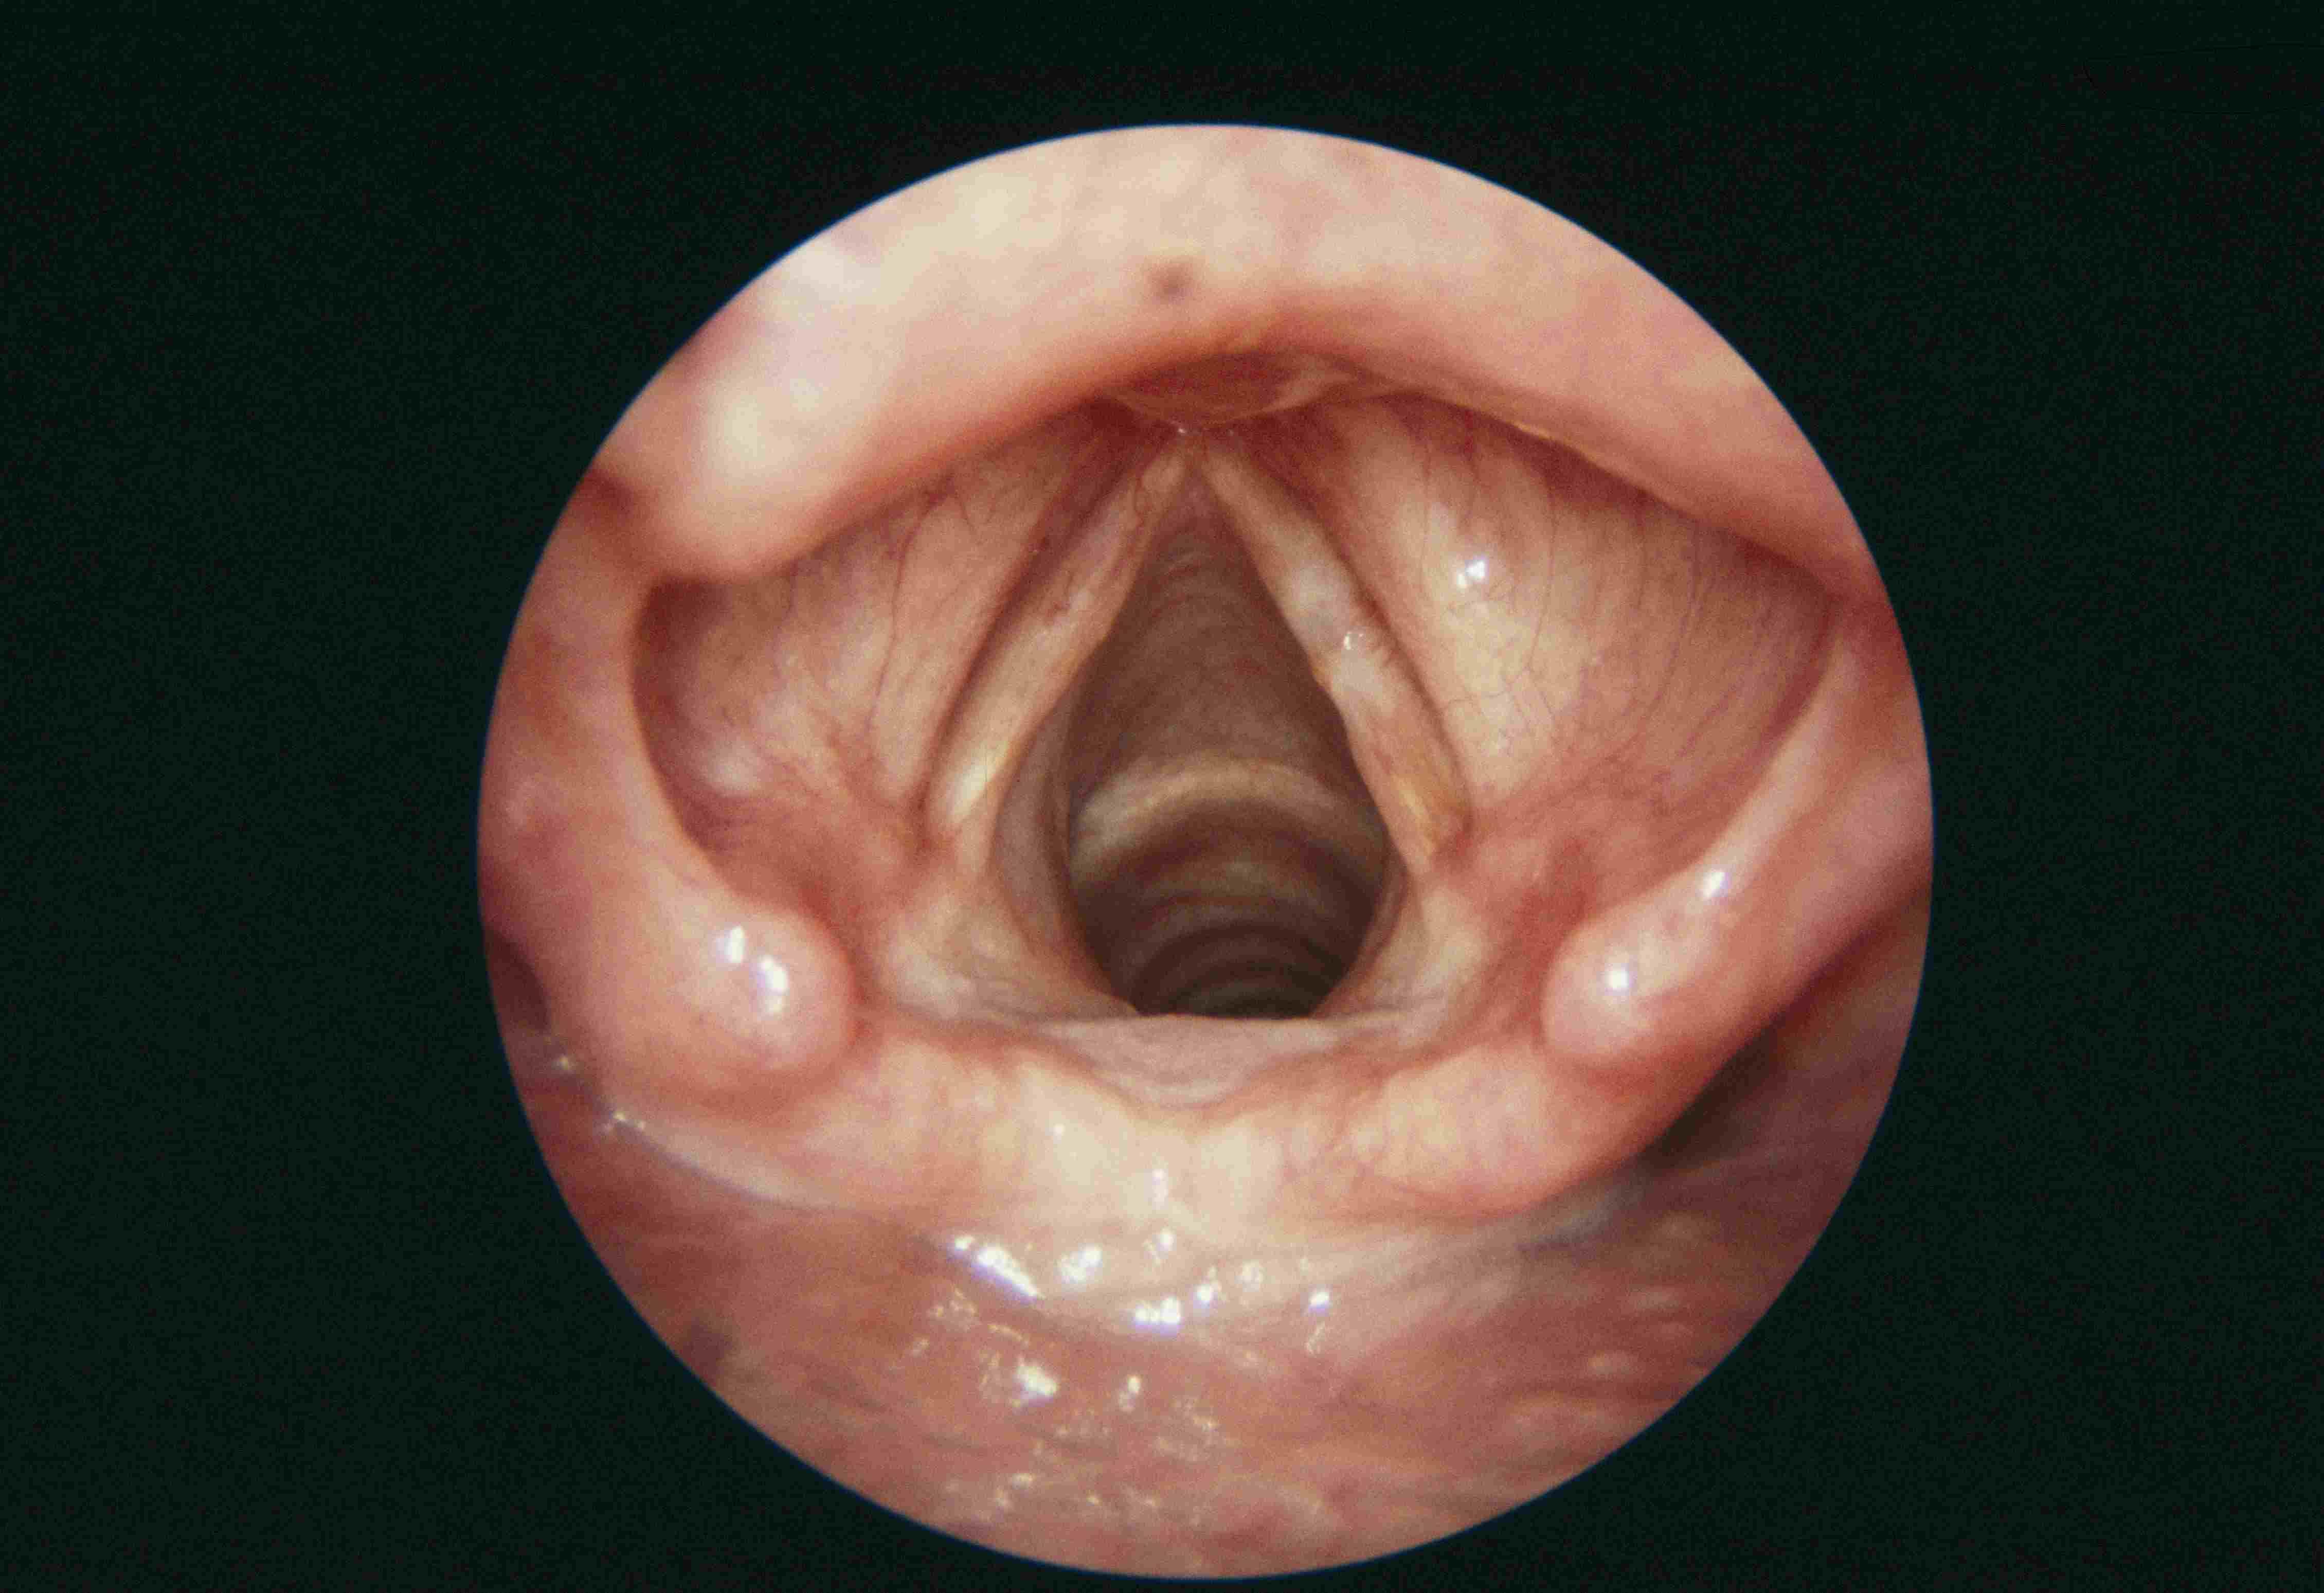 Resting larynx